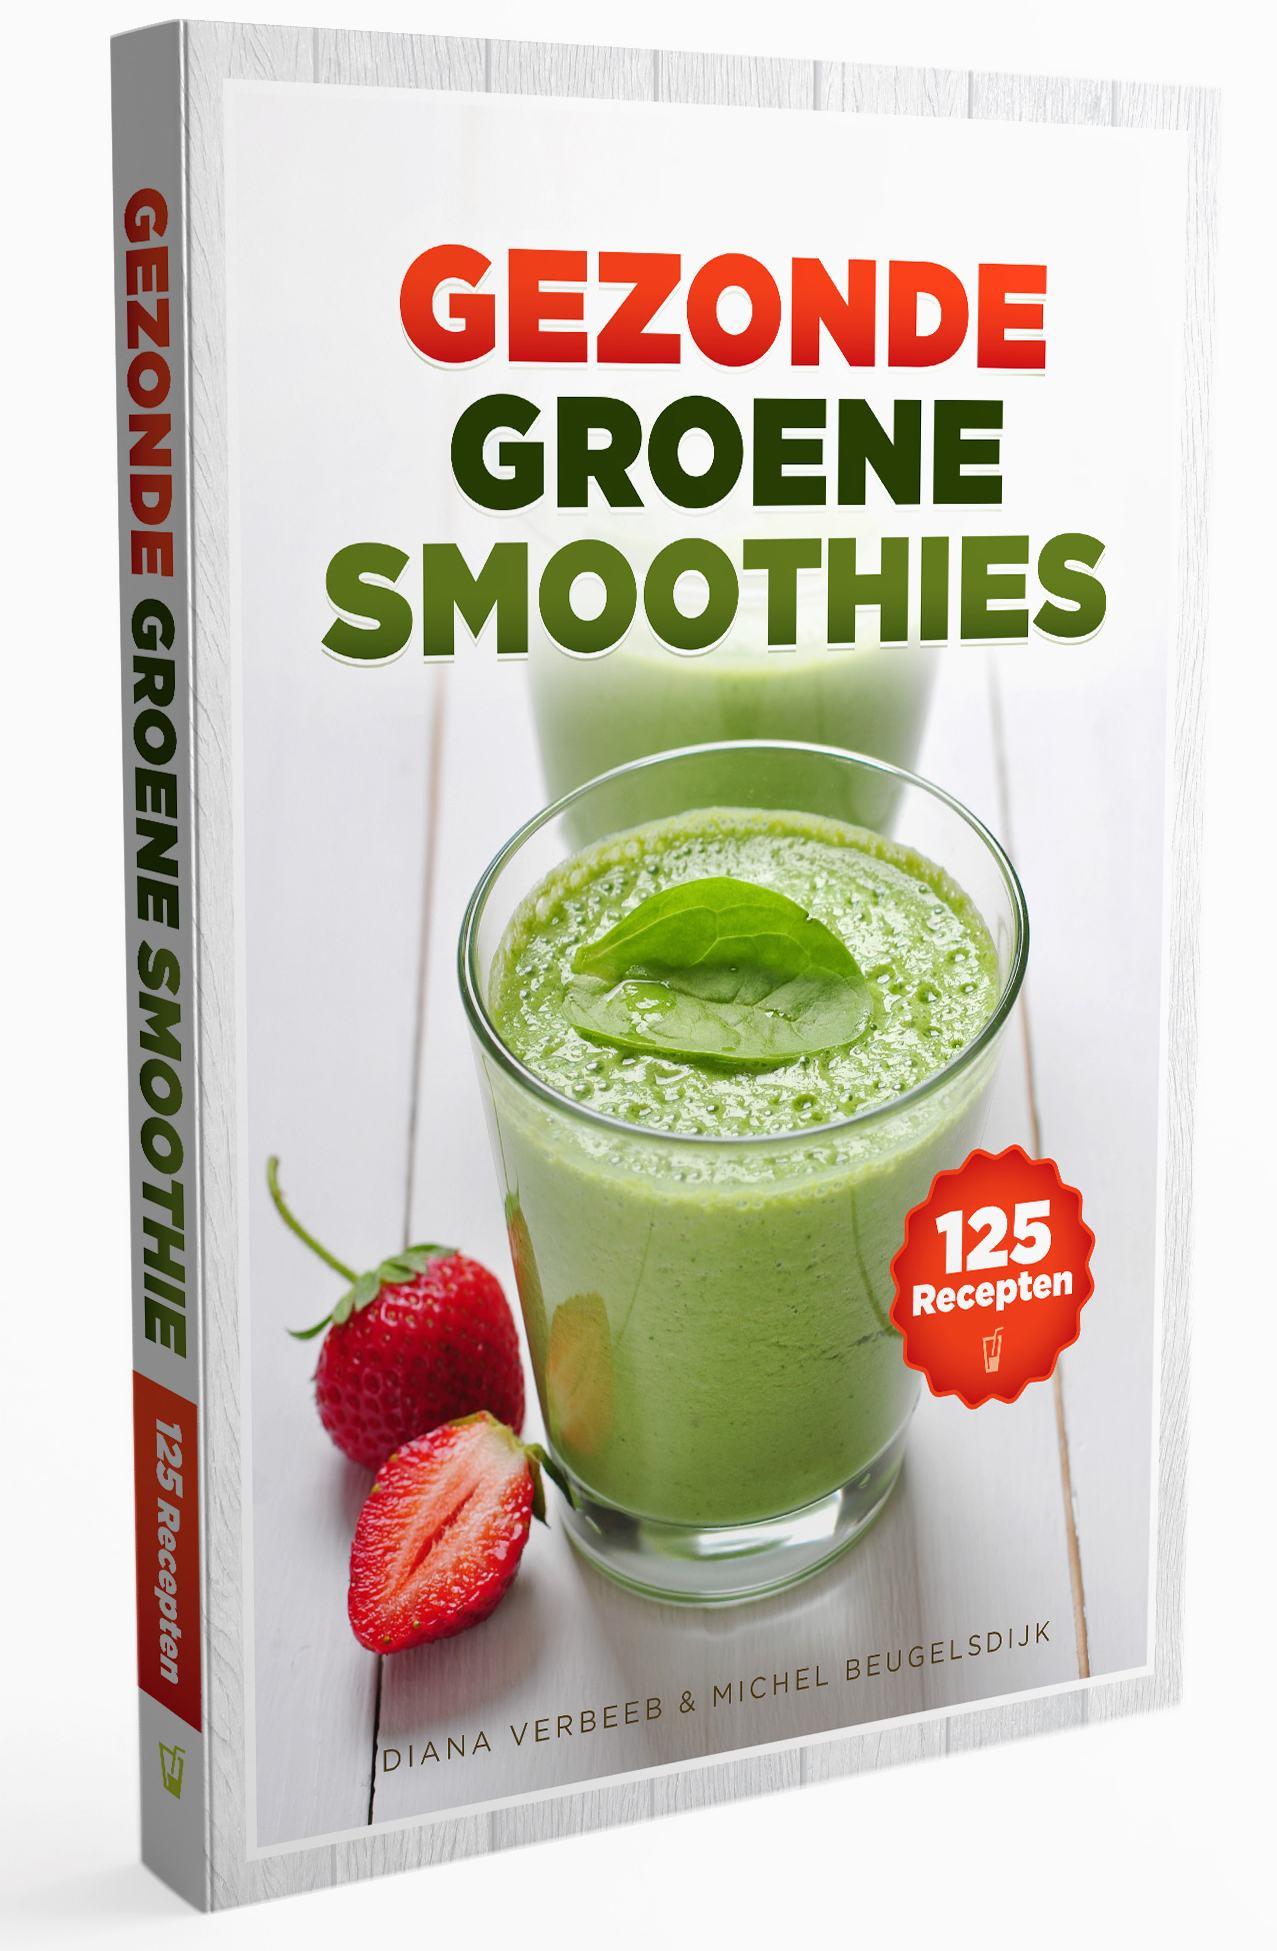 fibromyalgie-pds-gezonde-groene-smoothies-fibromyalgieblog